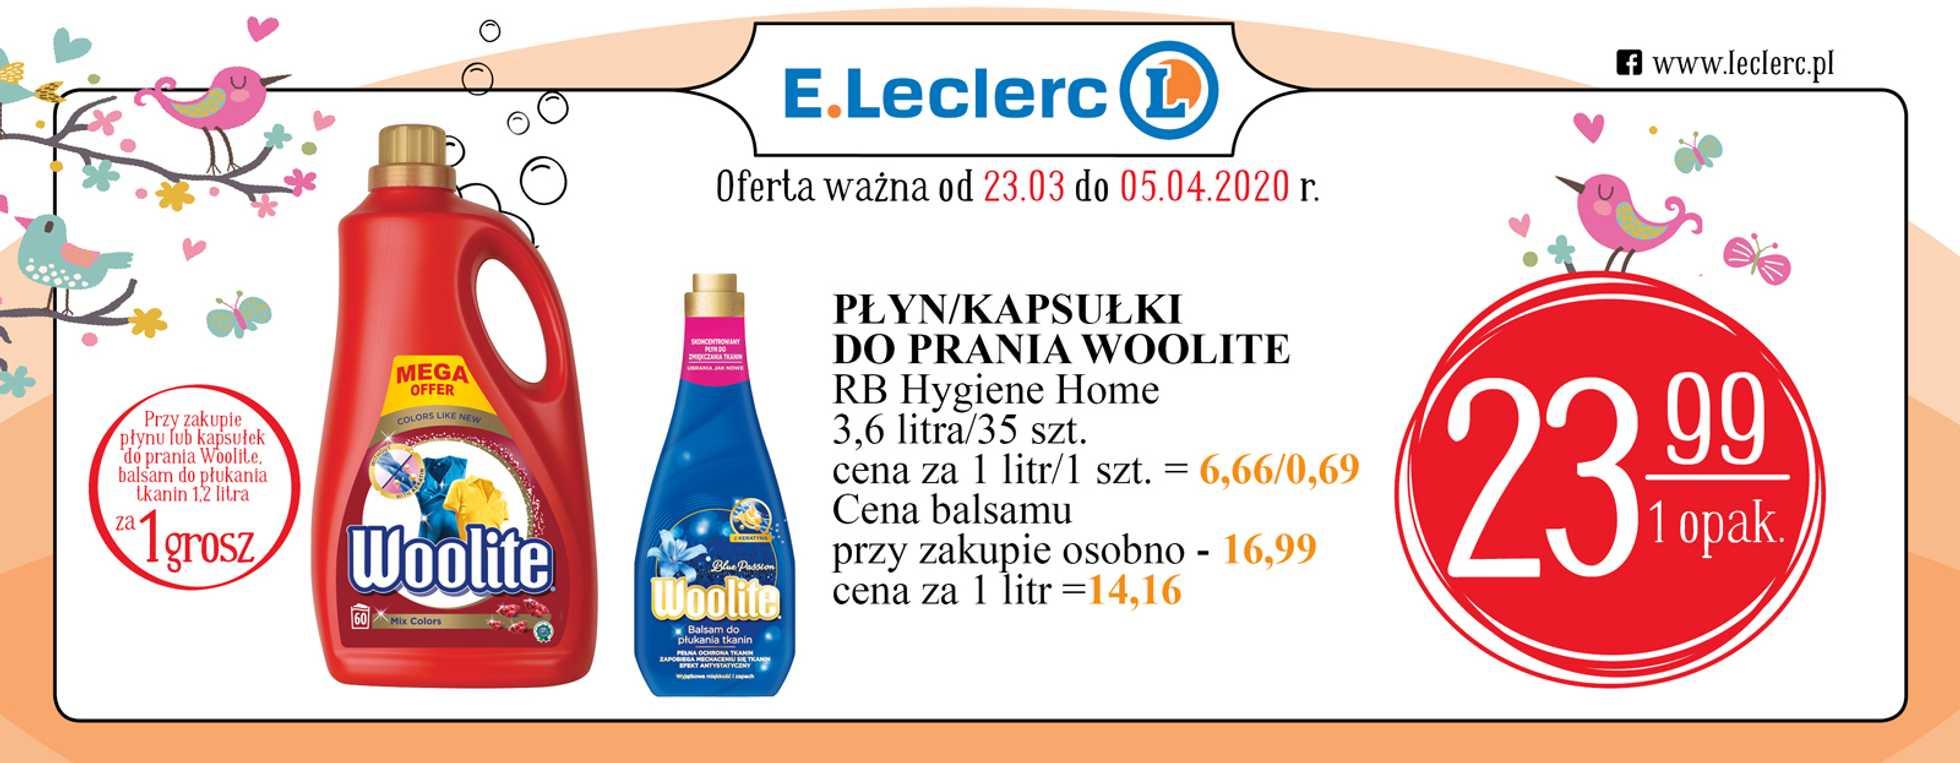 E.Leclerc - gazetka promocyjna ważna od 23.03.2020 do 05.04.2020 - strona 2.